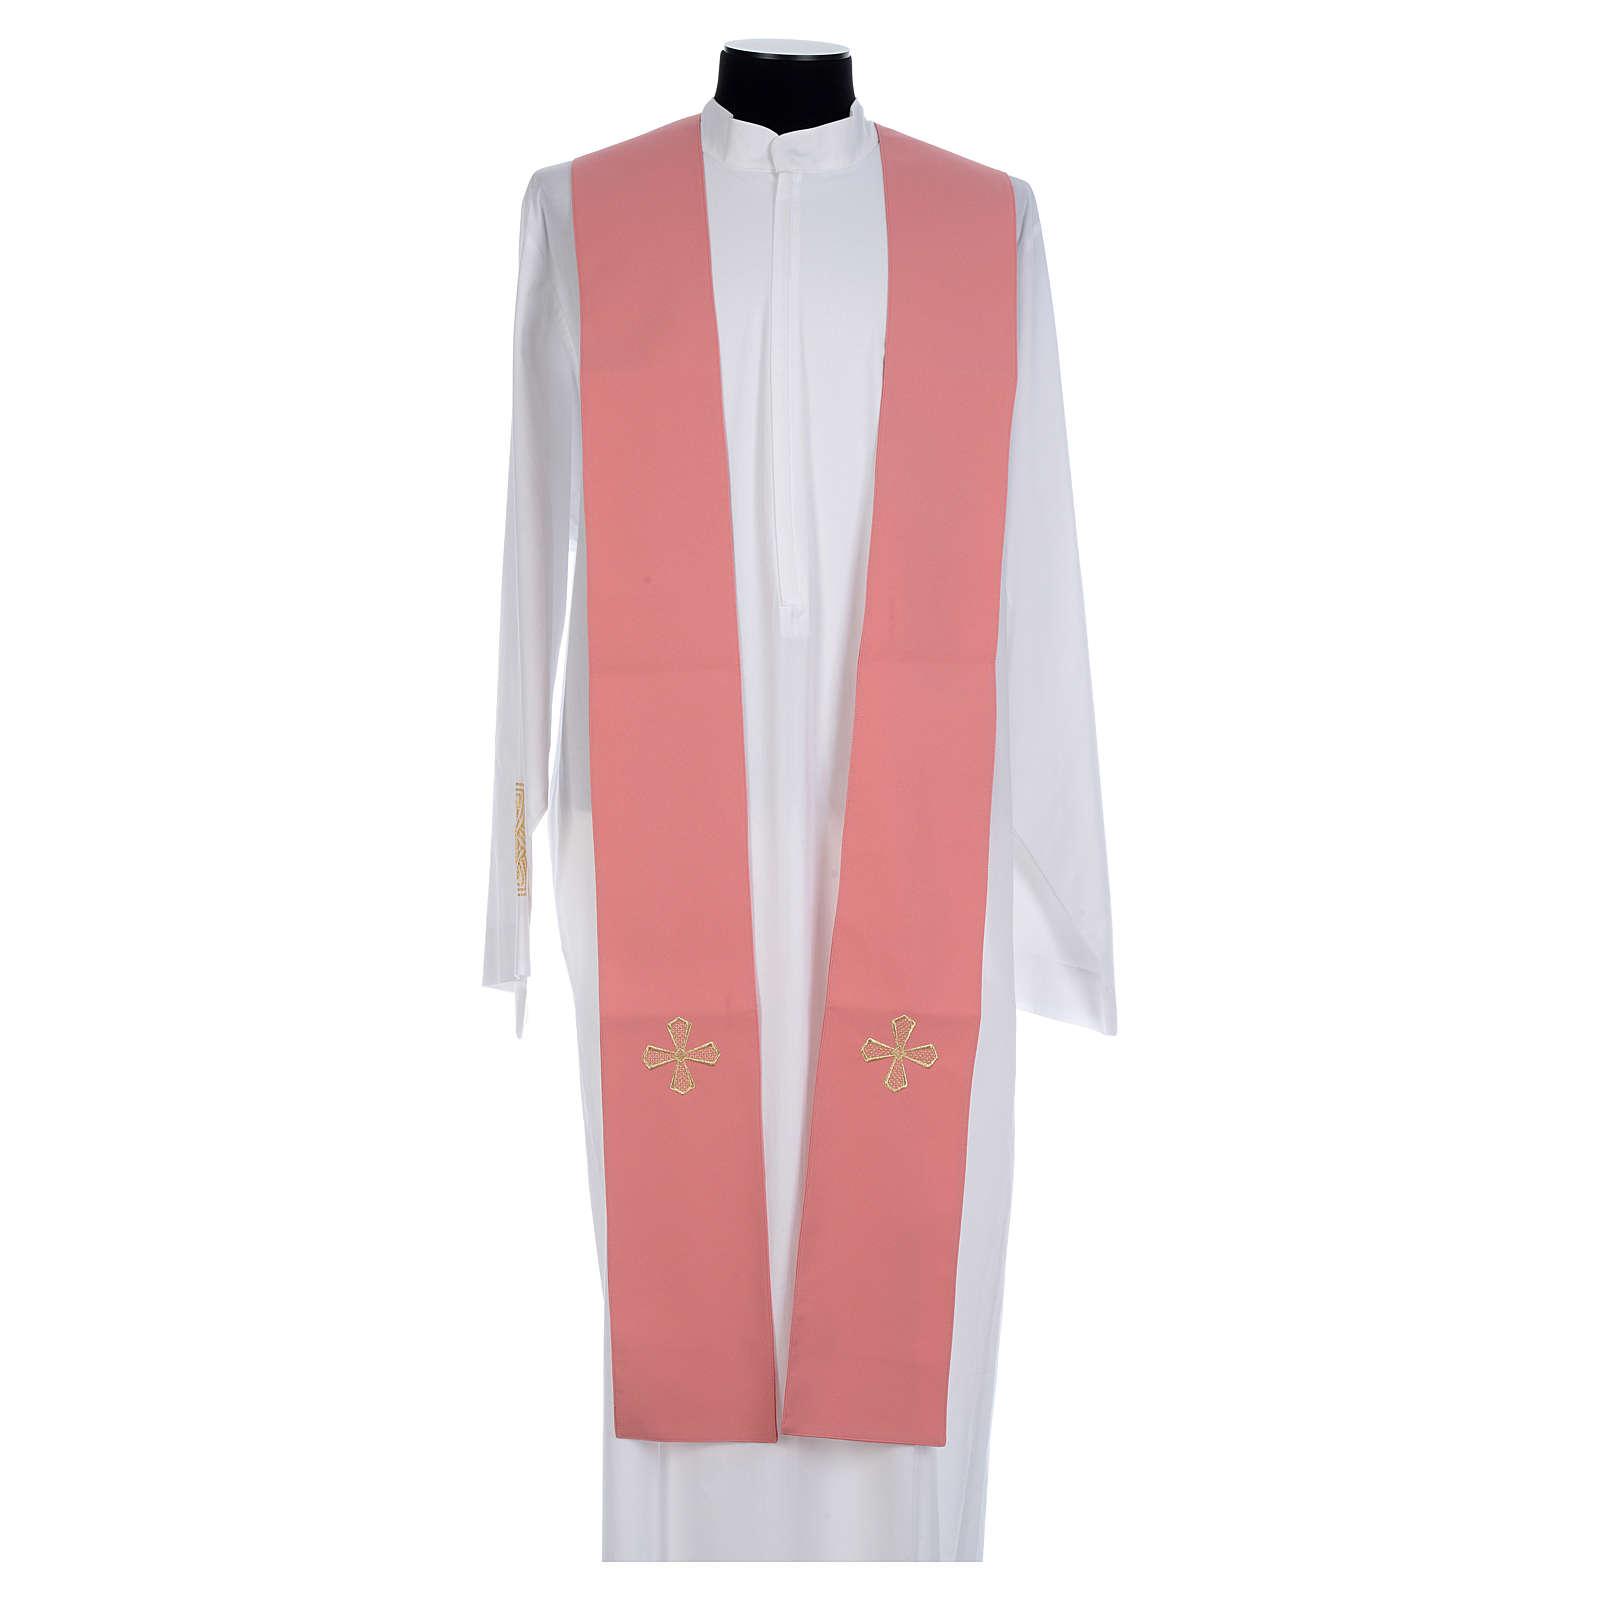 Casula cor-de-rosa 100% poliéster bandas aplicadas tecido cruz bordada 4